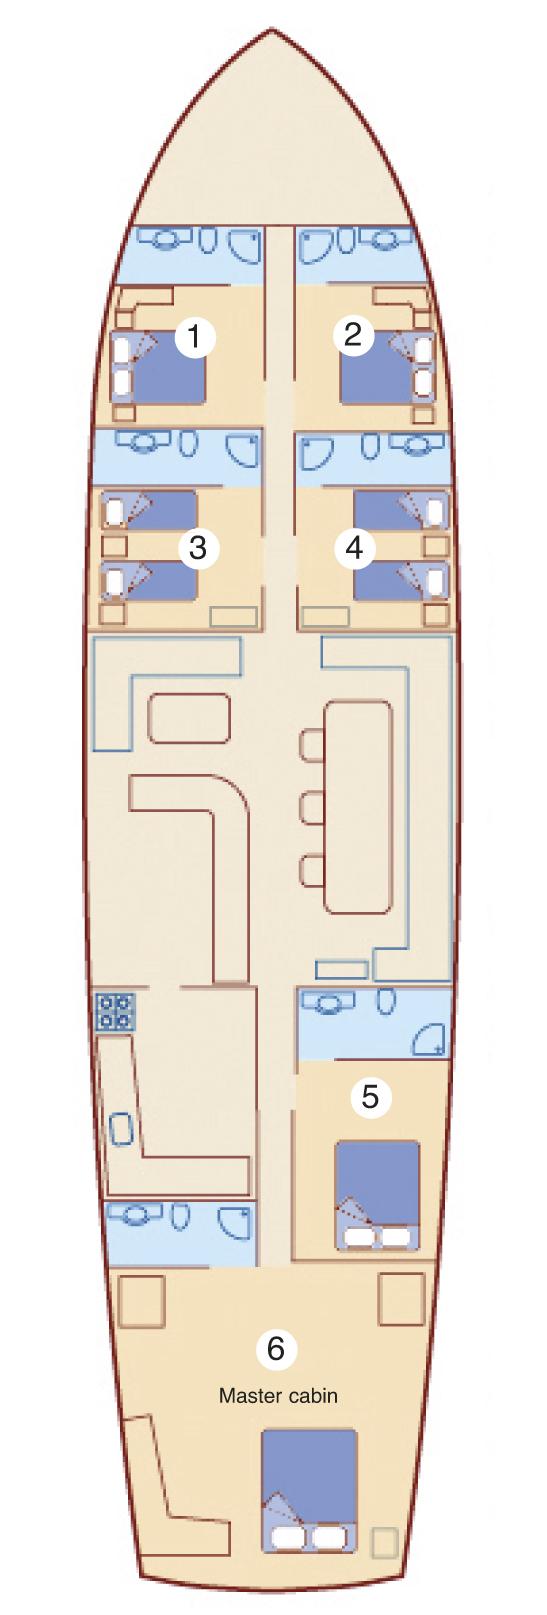 Salmakis-layout.jpg